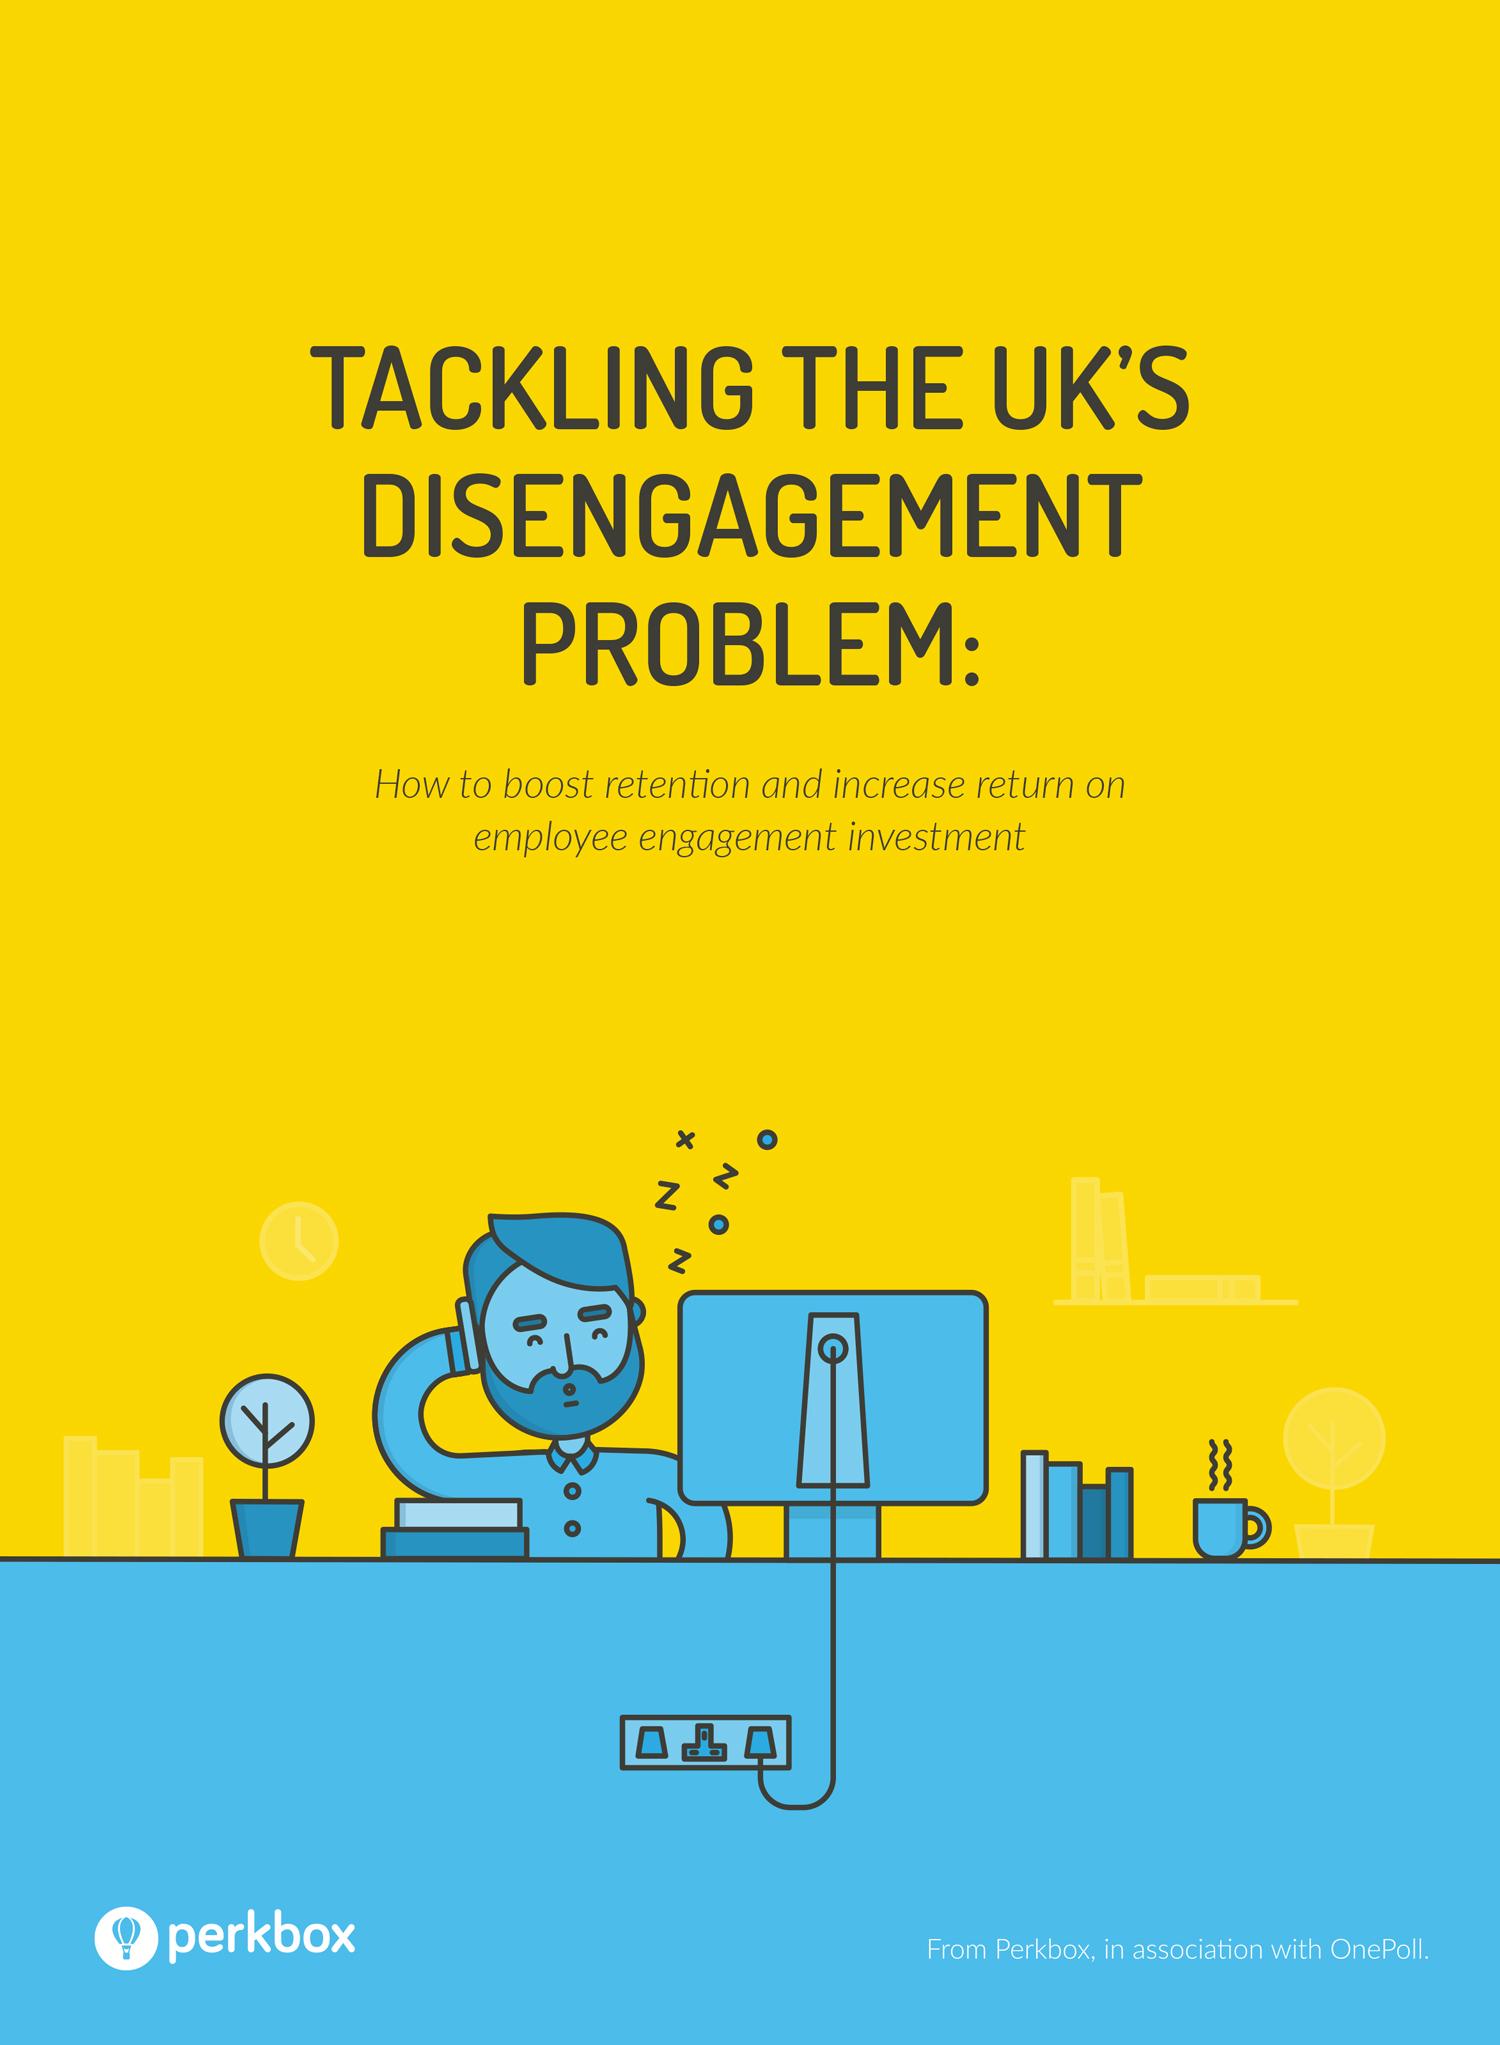 Tackling the UK's Disengagement Problem